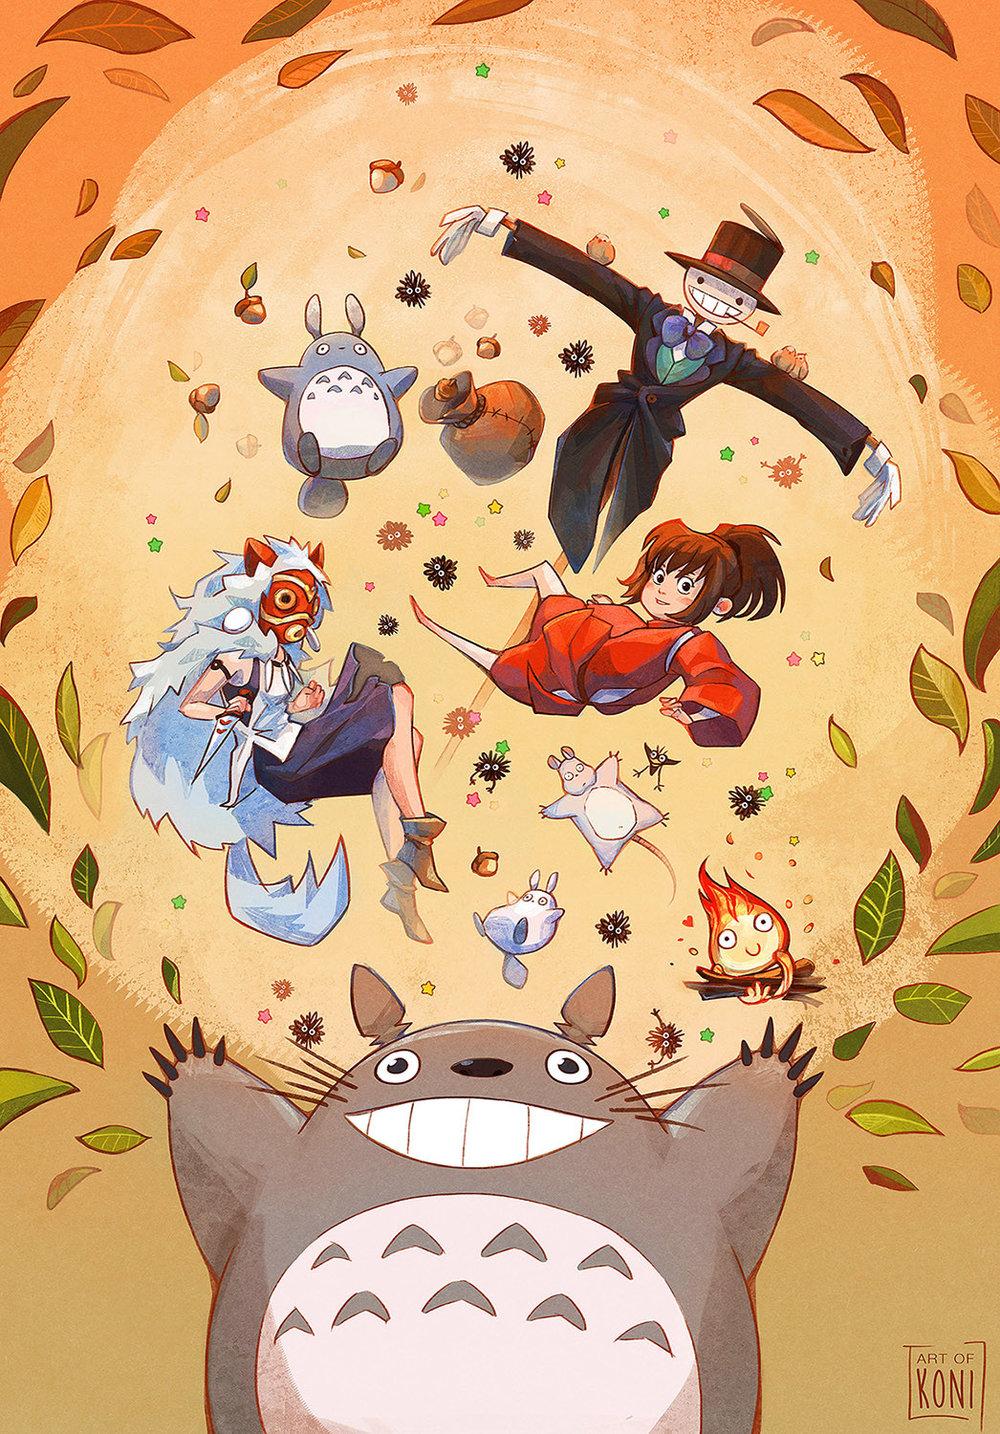 koni-amandine-girard-amandine-girard-koni-animeland-ghibli-lowres.jpg